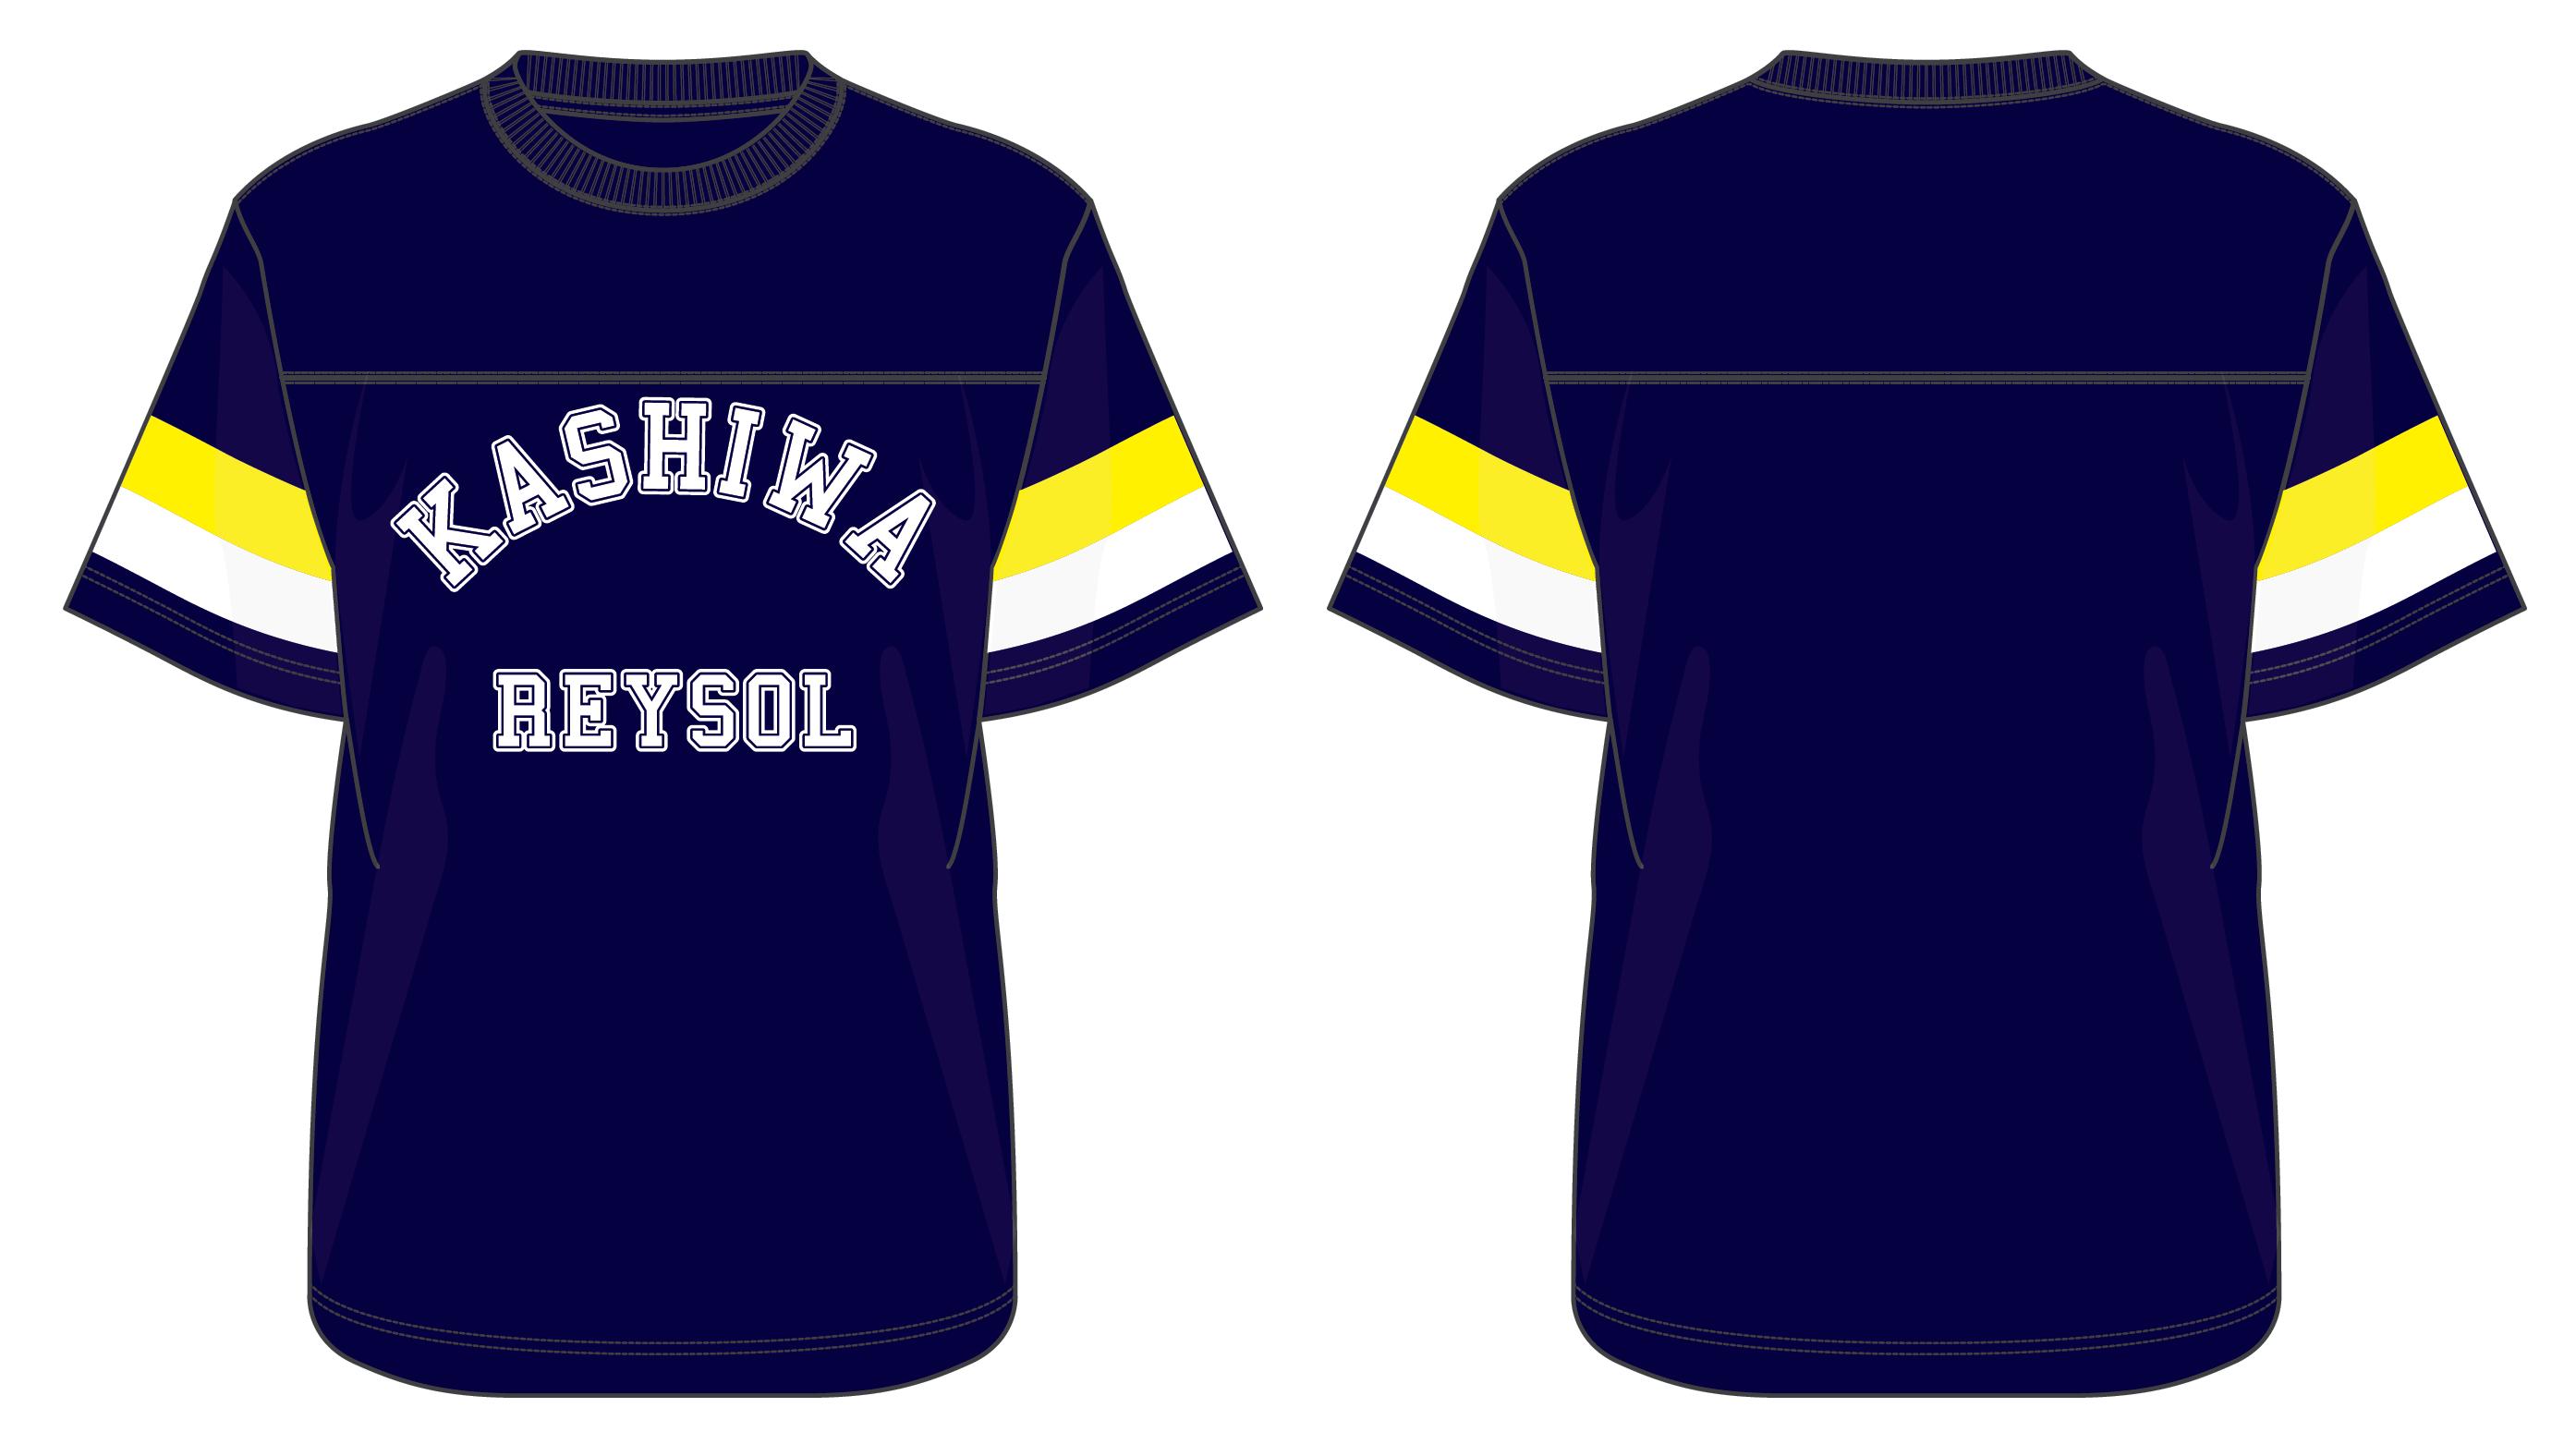 190428_Tshirts.png